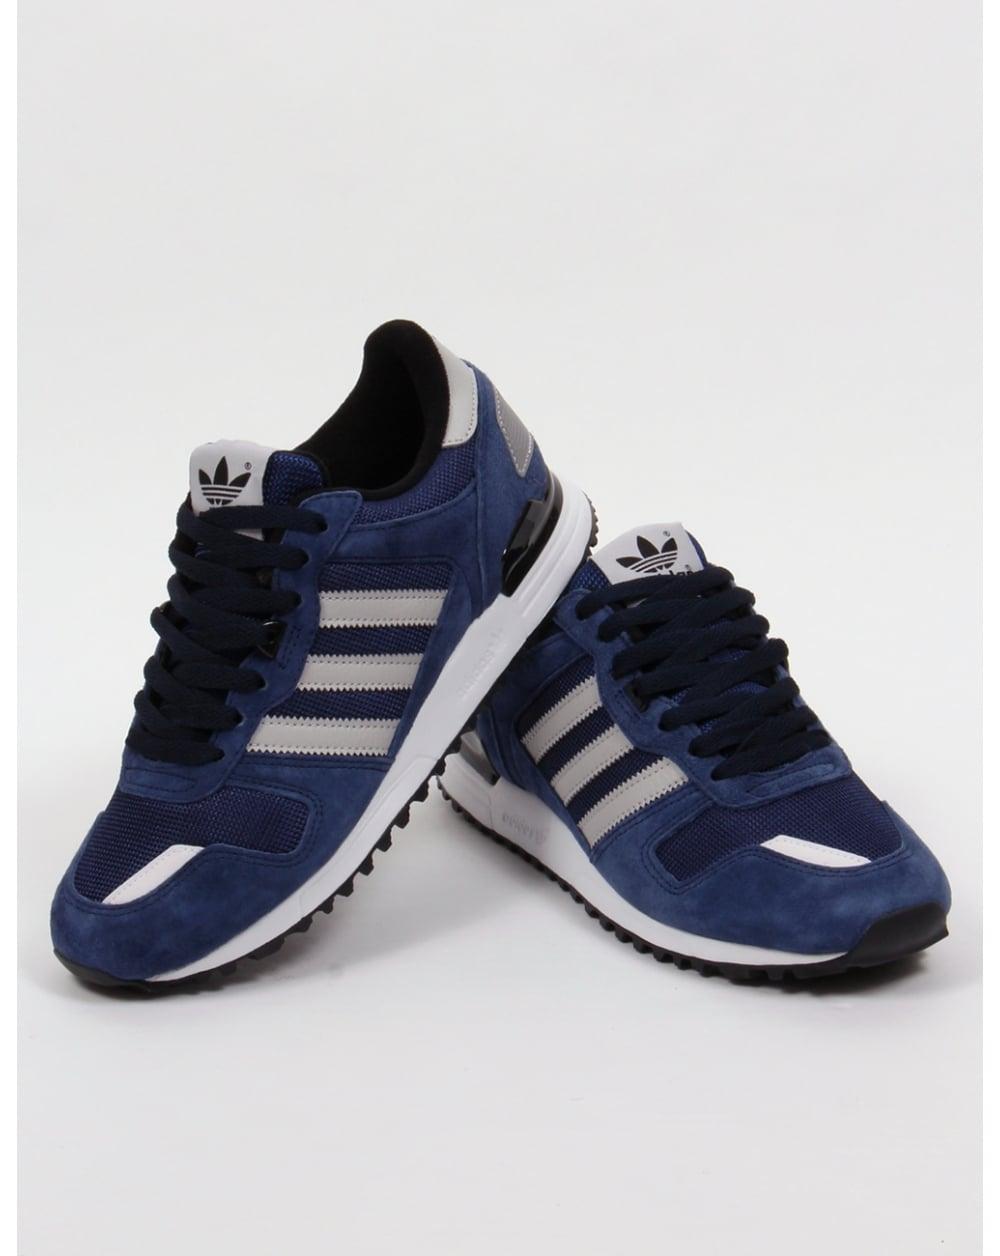 Adidas Zx 700 Trainers Navy/grey/black,originals,shoes ...